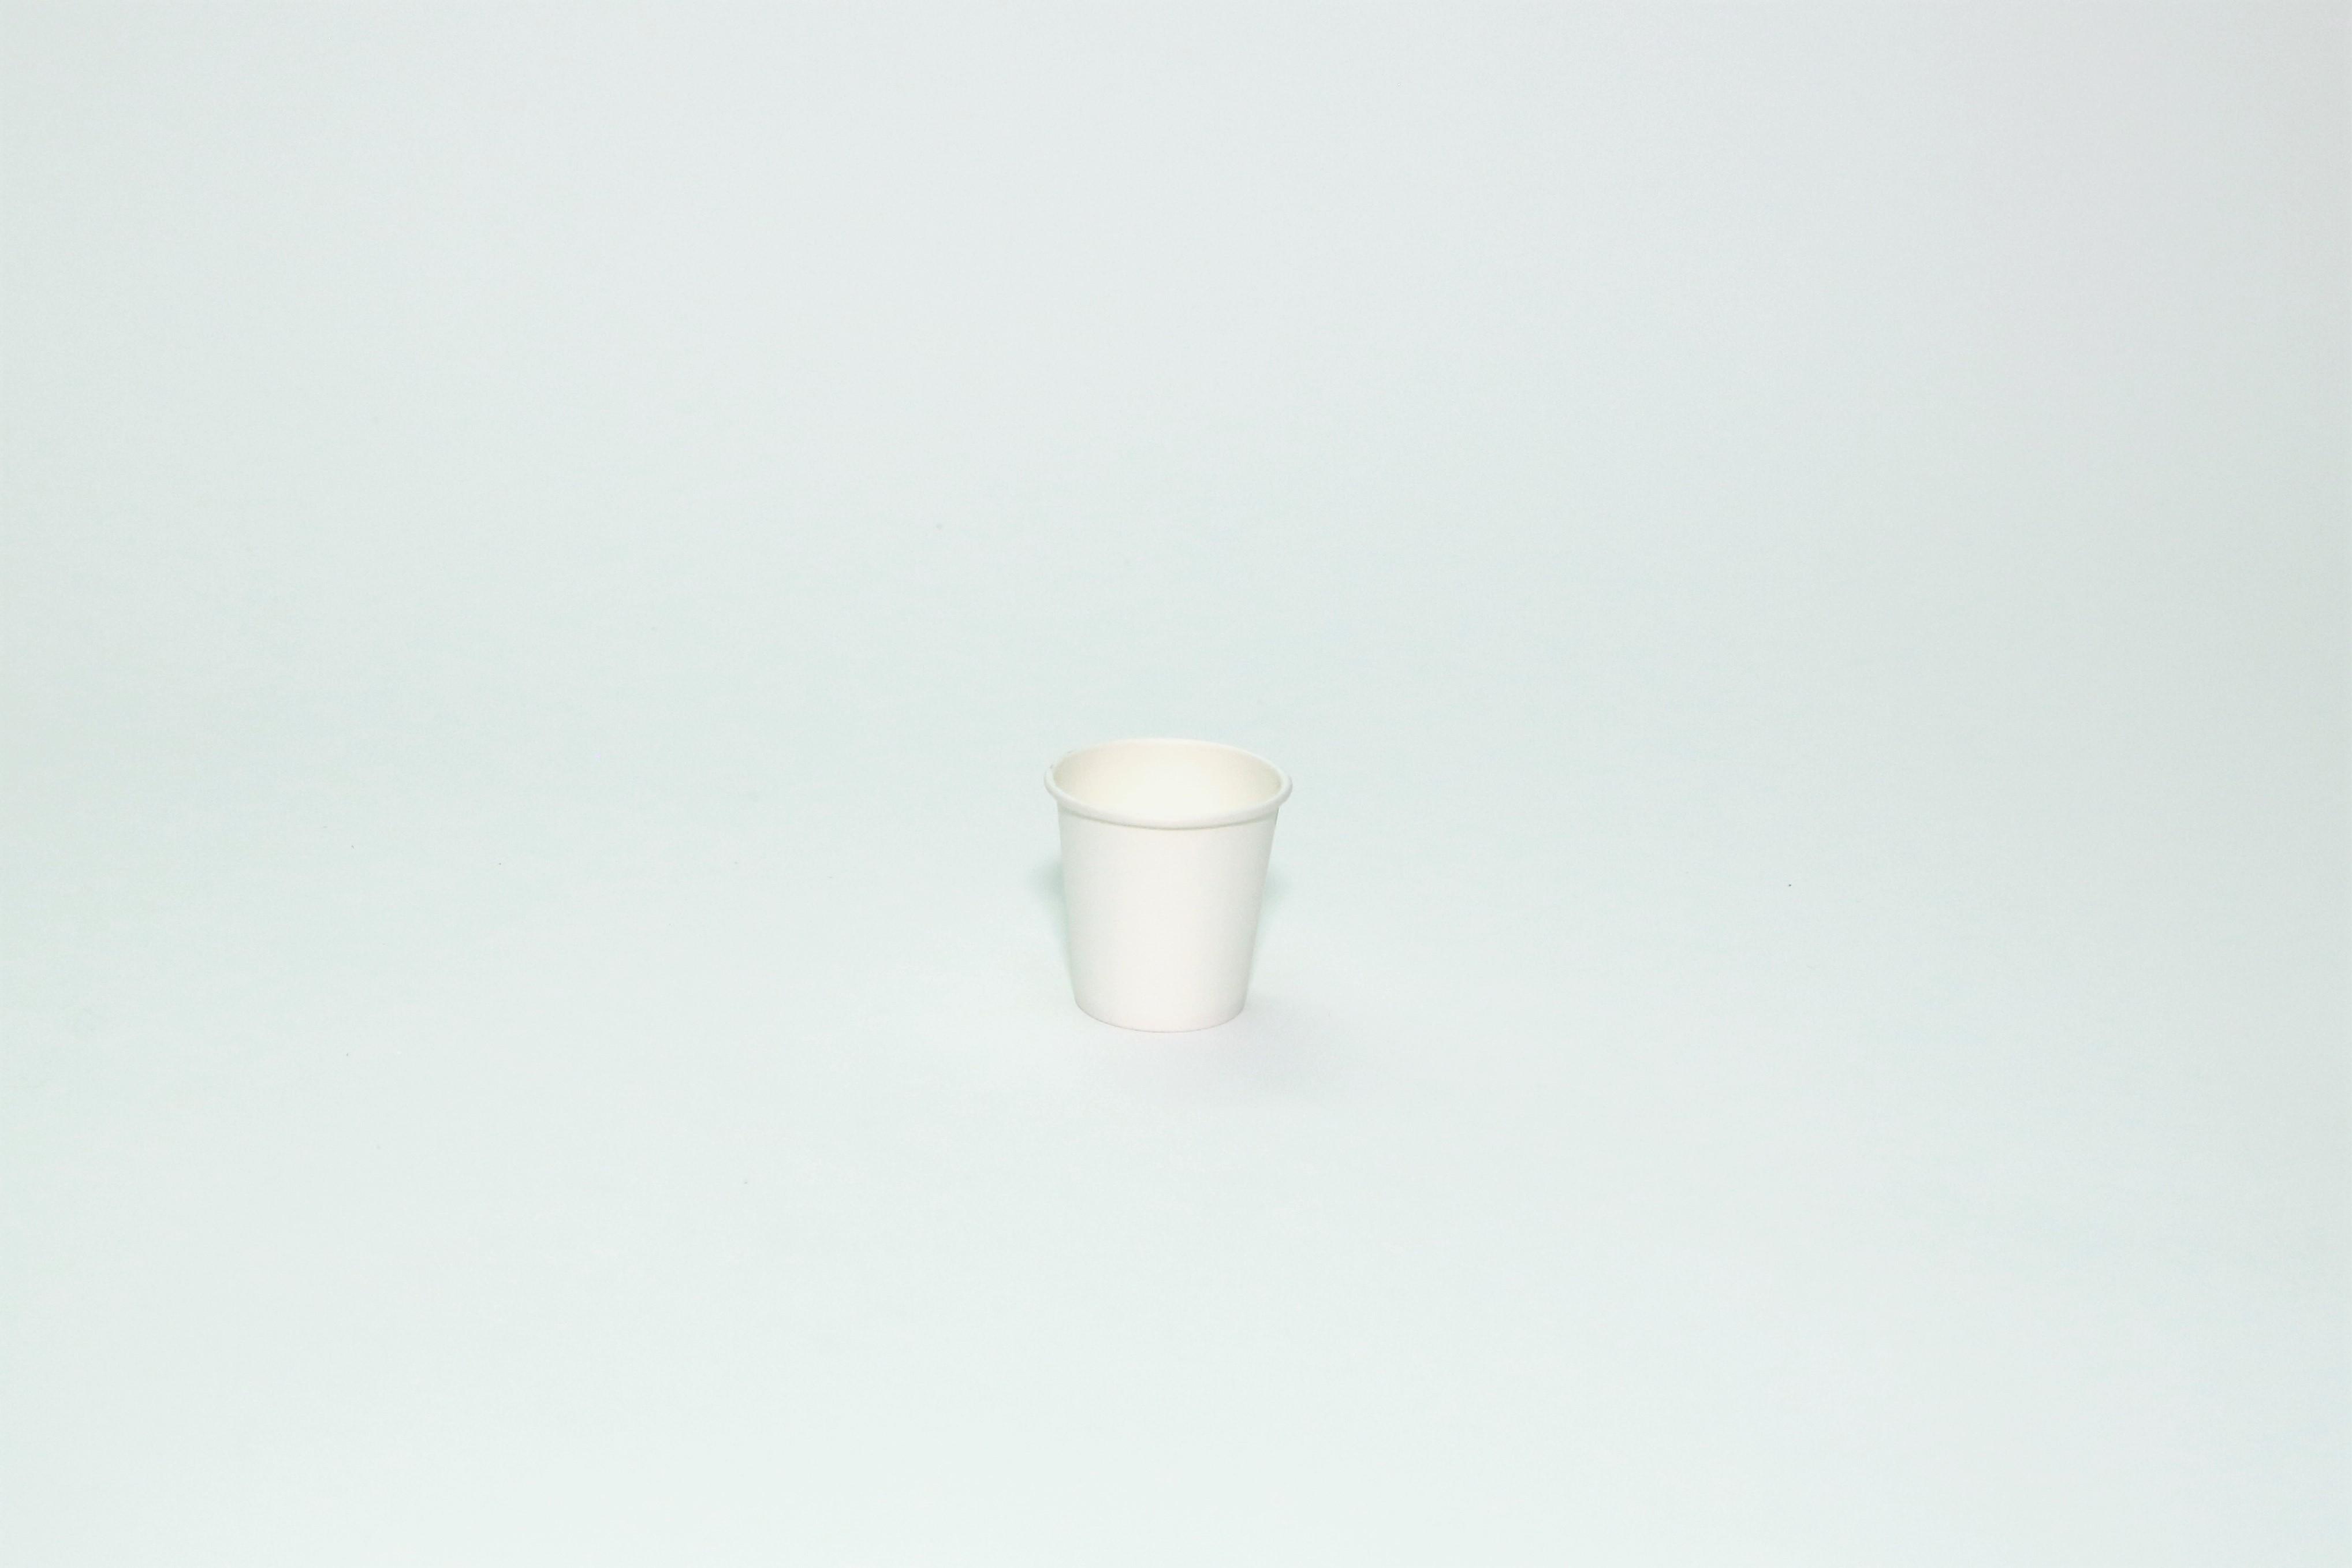 Copo Papel Café 3oz (40 sacos x 500 pcs)